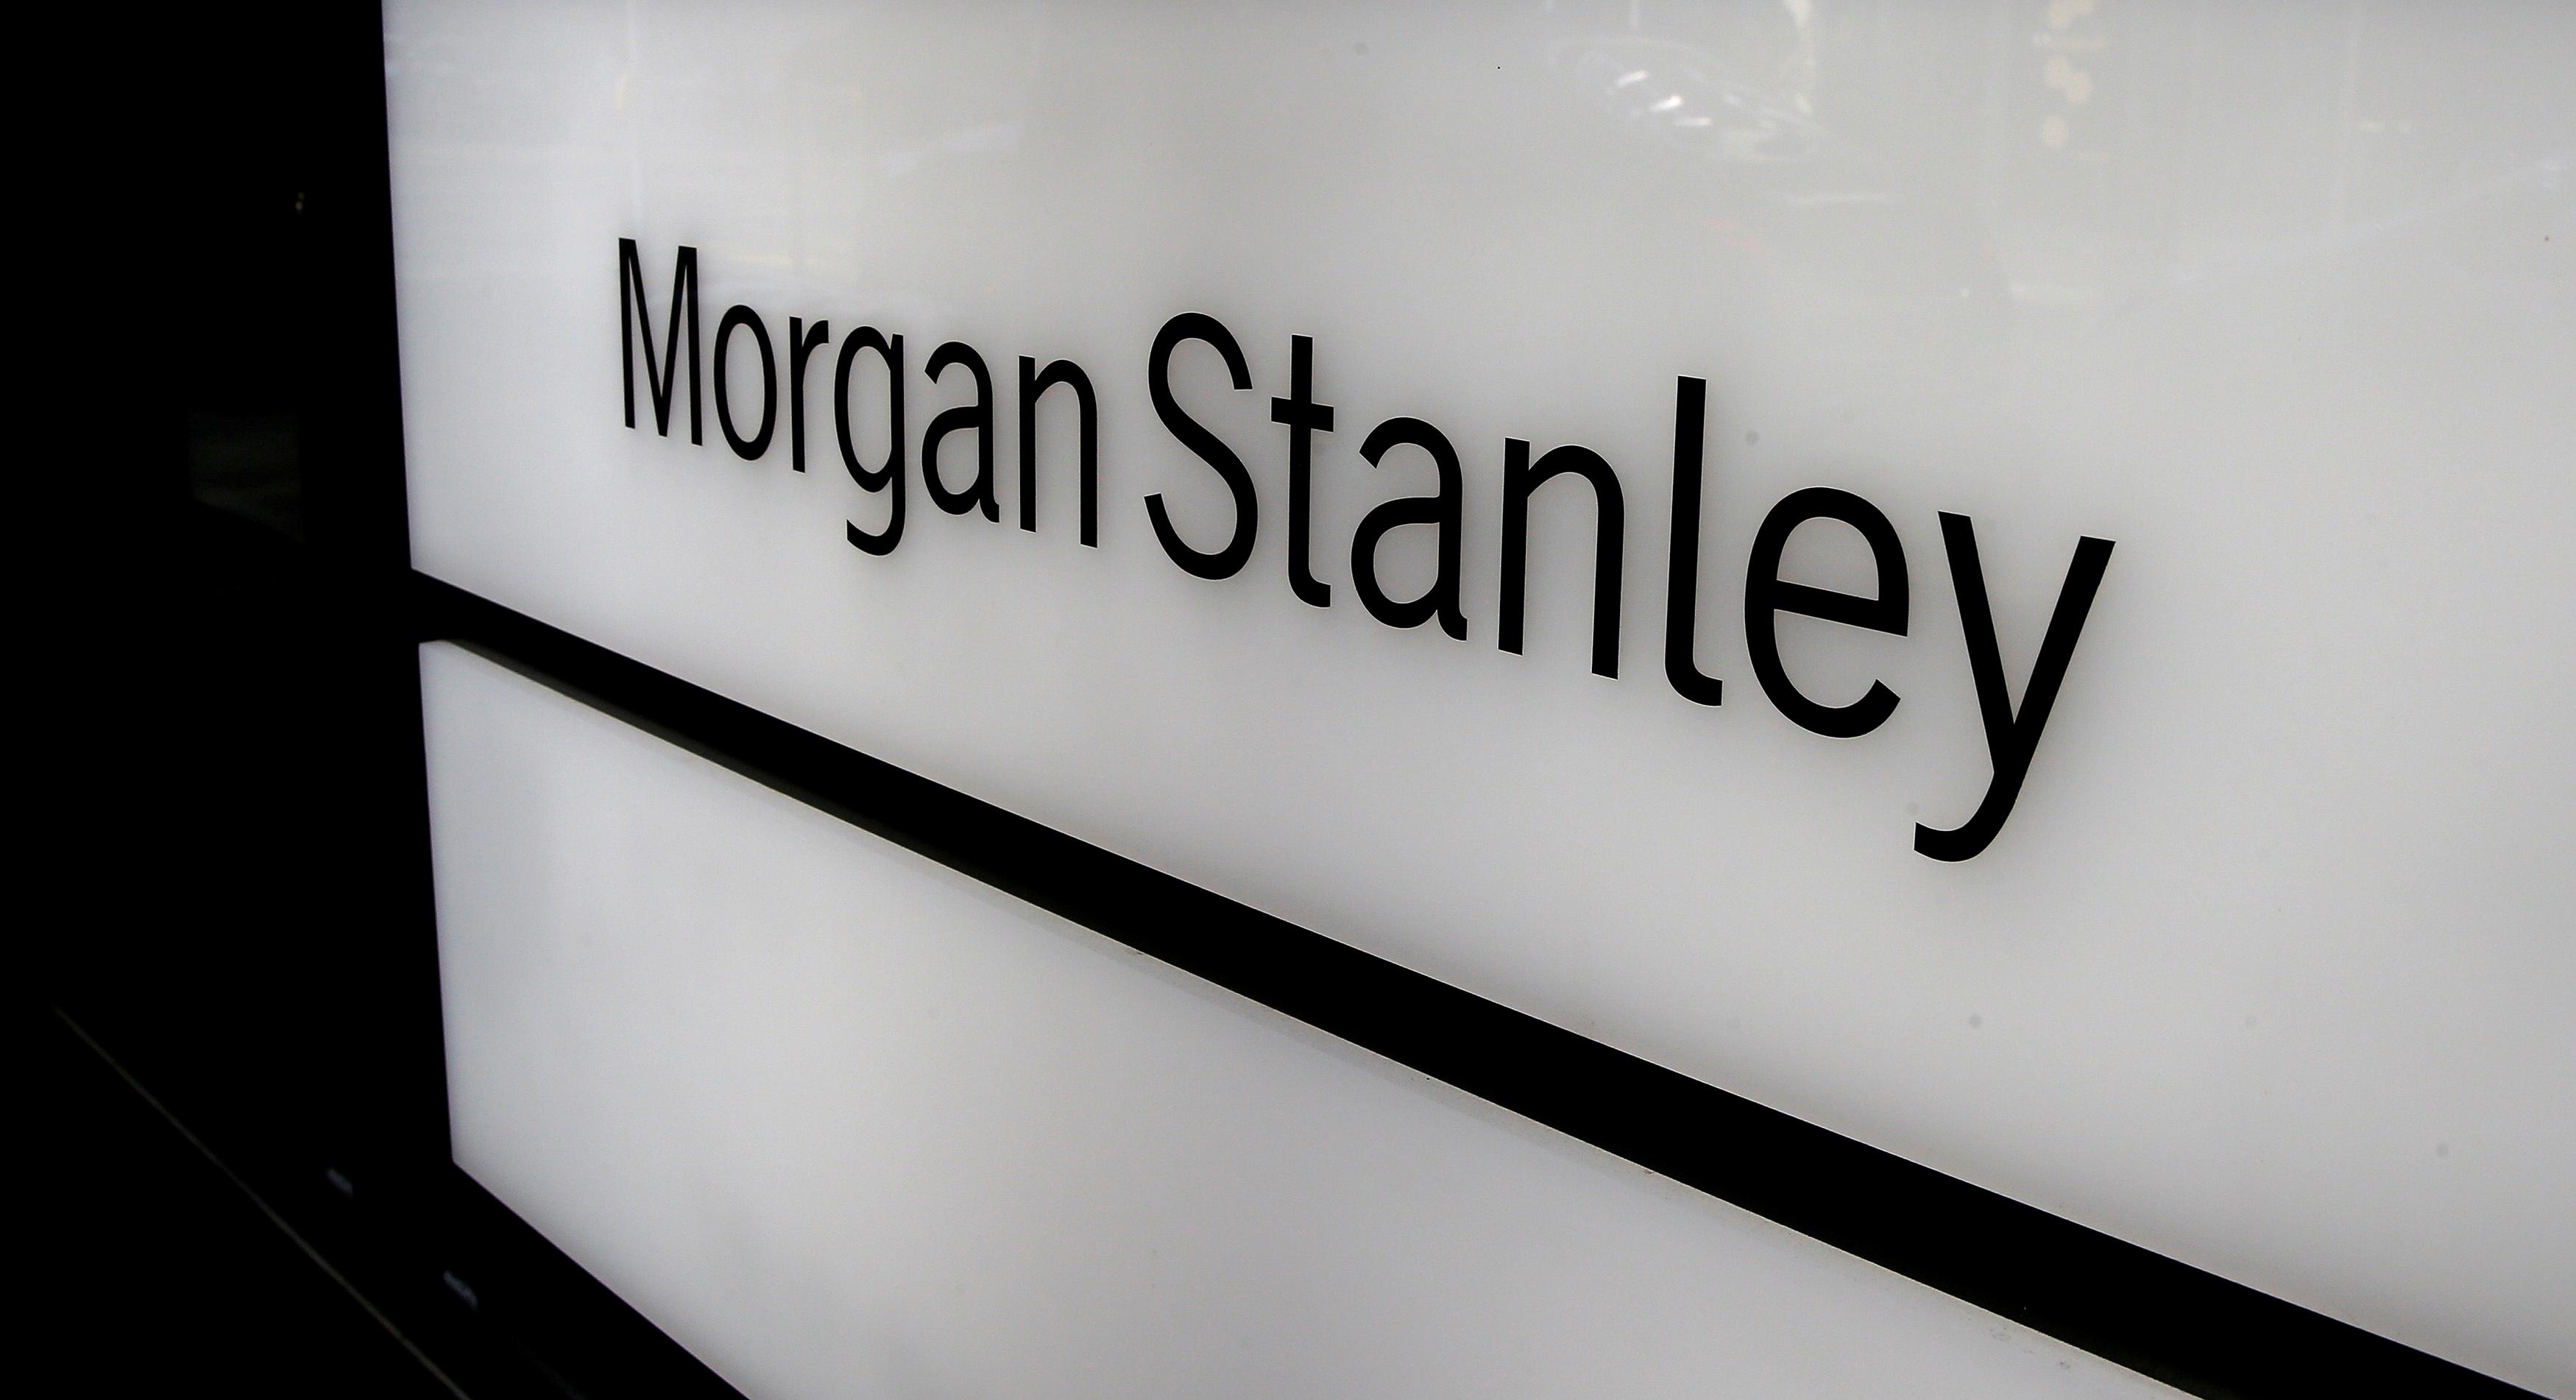 The logo of Morgan Stanley is seen at an office building in Zurich, Switzerland, September 22, 2016.  REUTERS/Arnd Wiegmann/File Photo